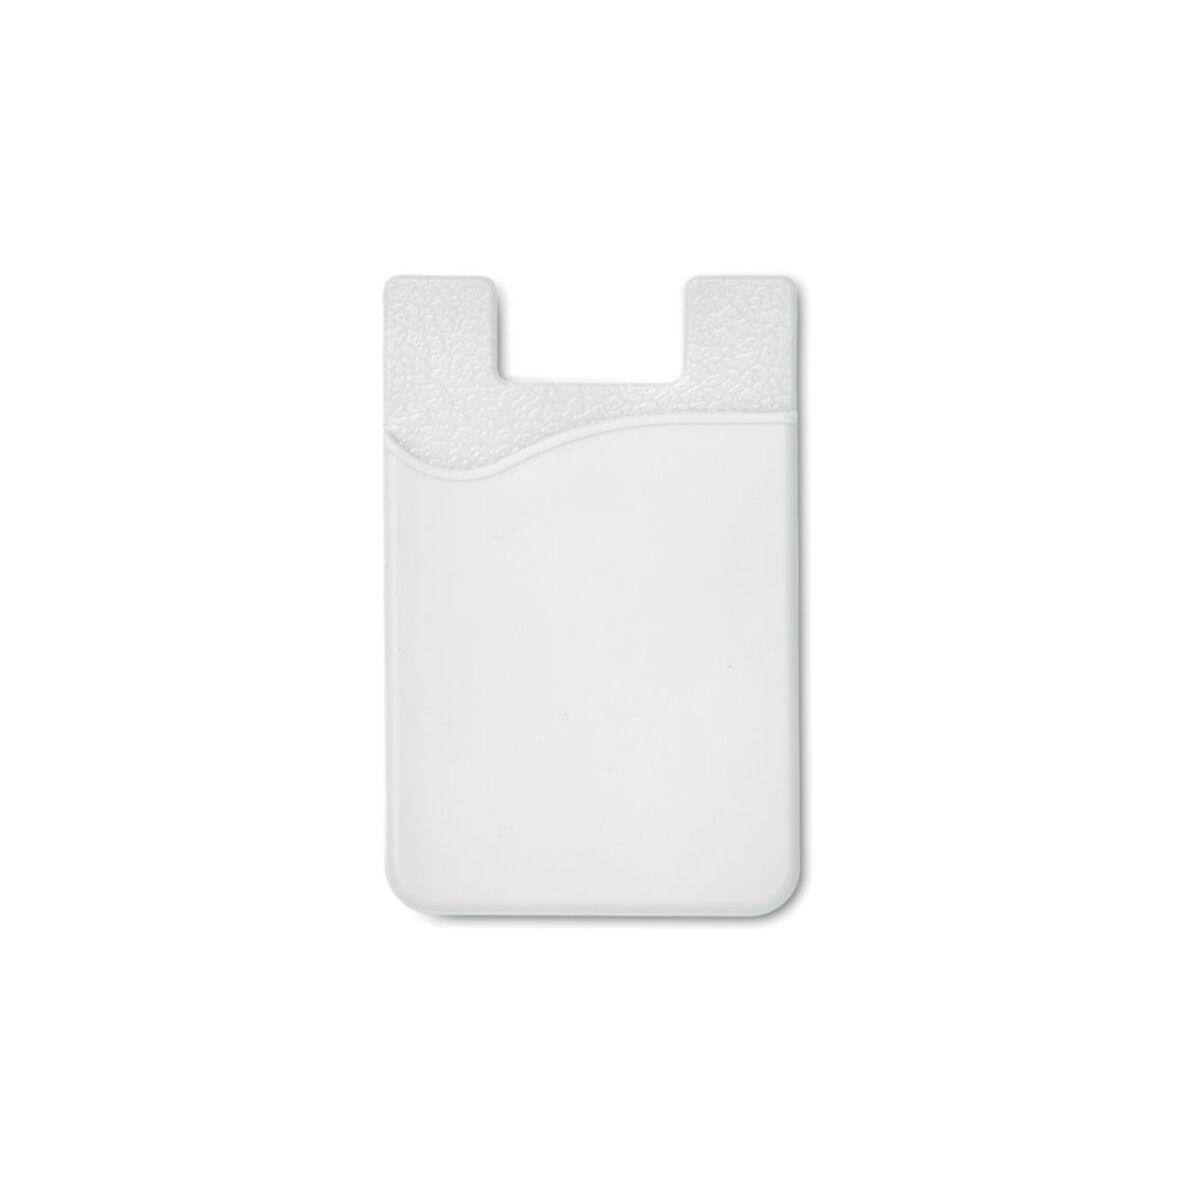 Smartphone Cardholder (White)